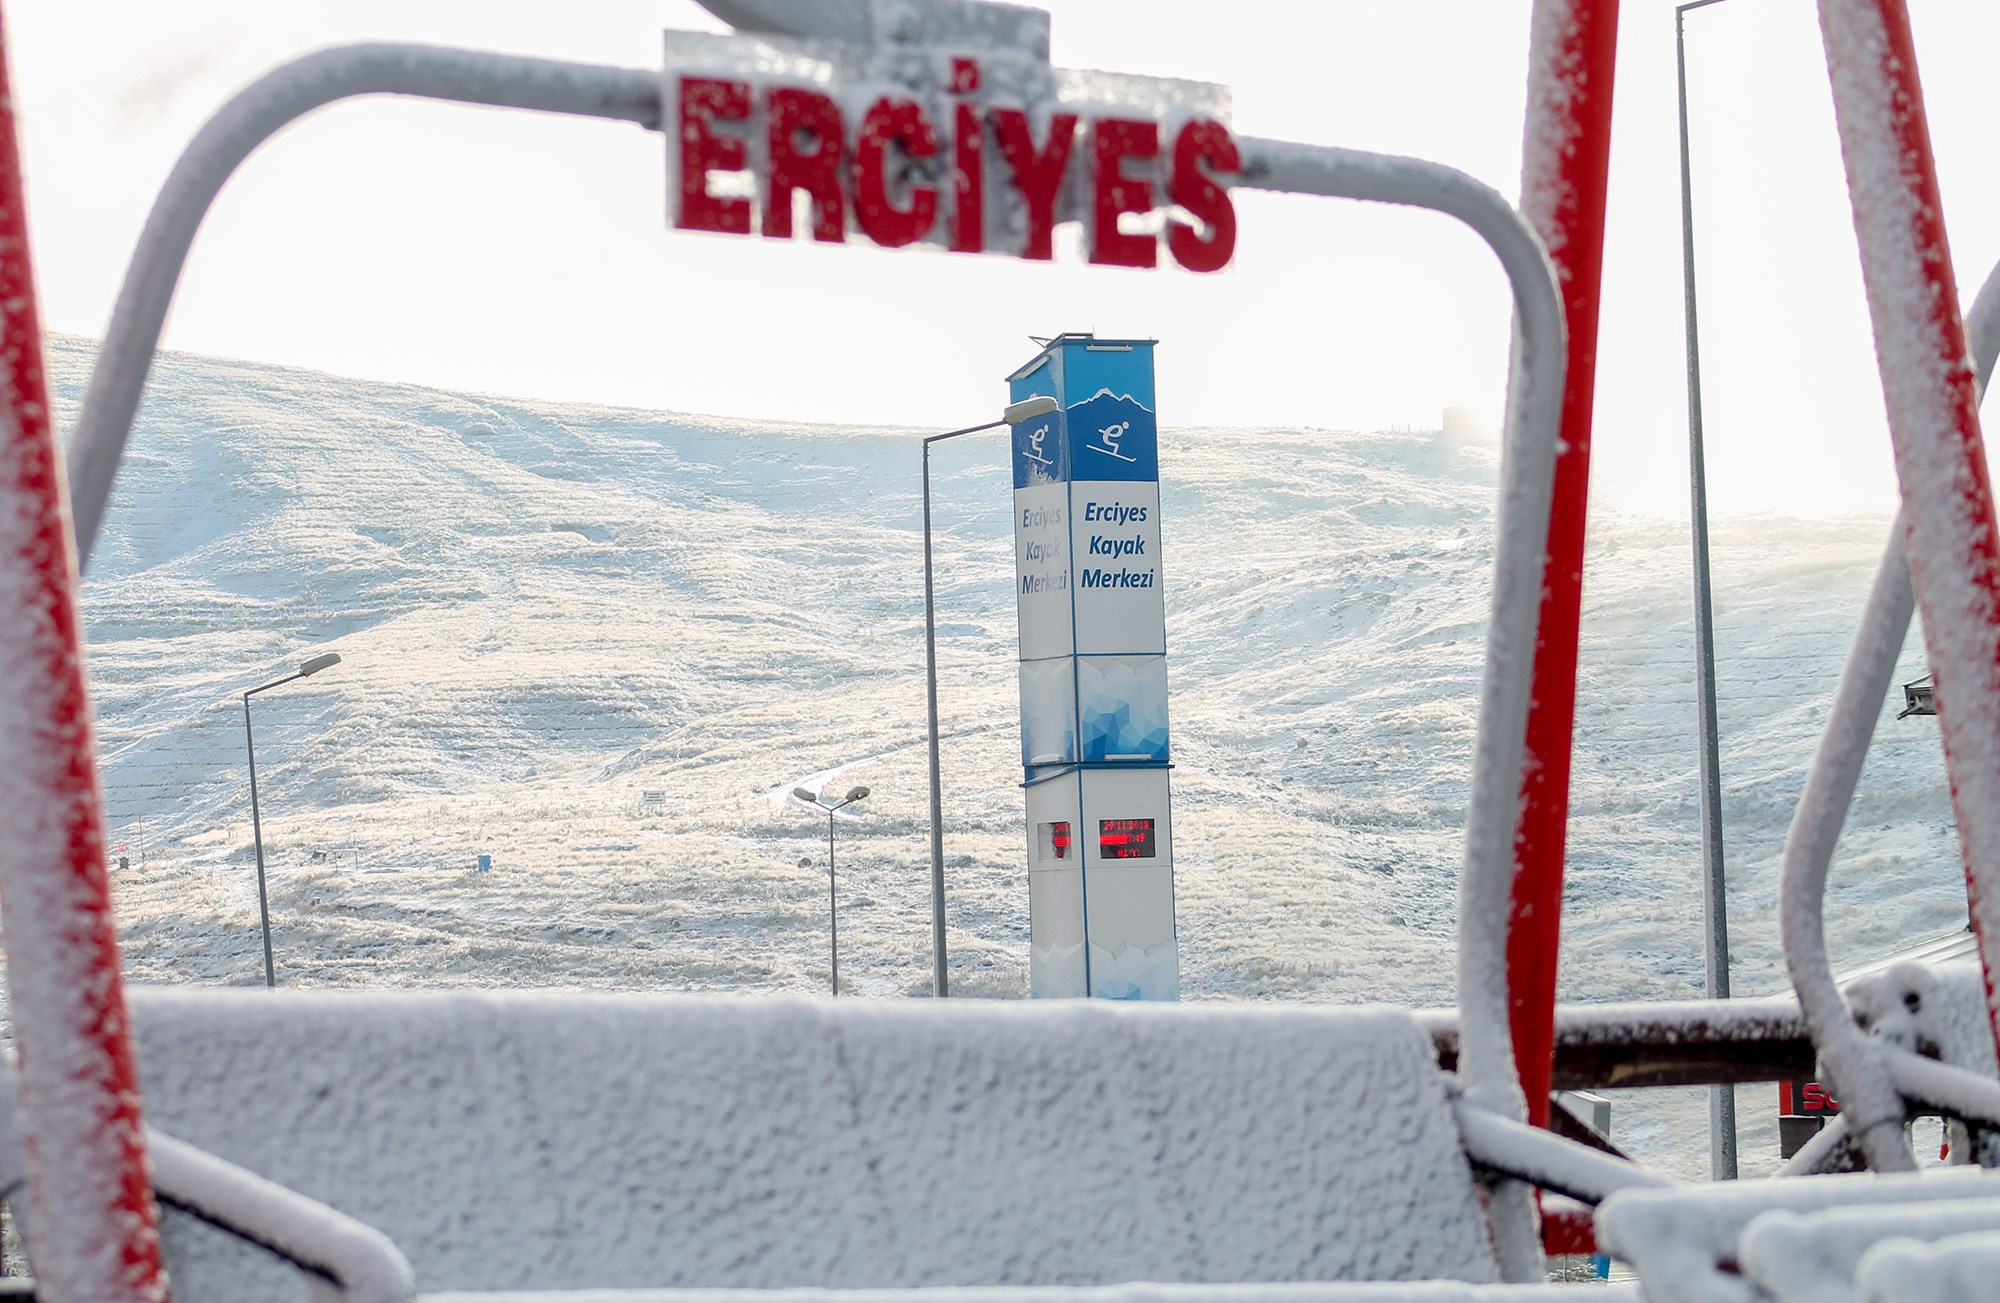 Snow arrives in Turkey, Erciyes Ski Resort